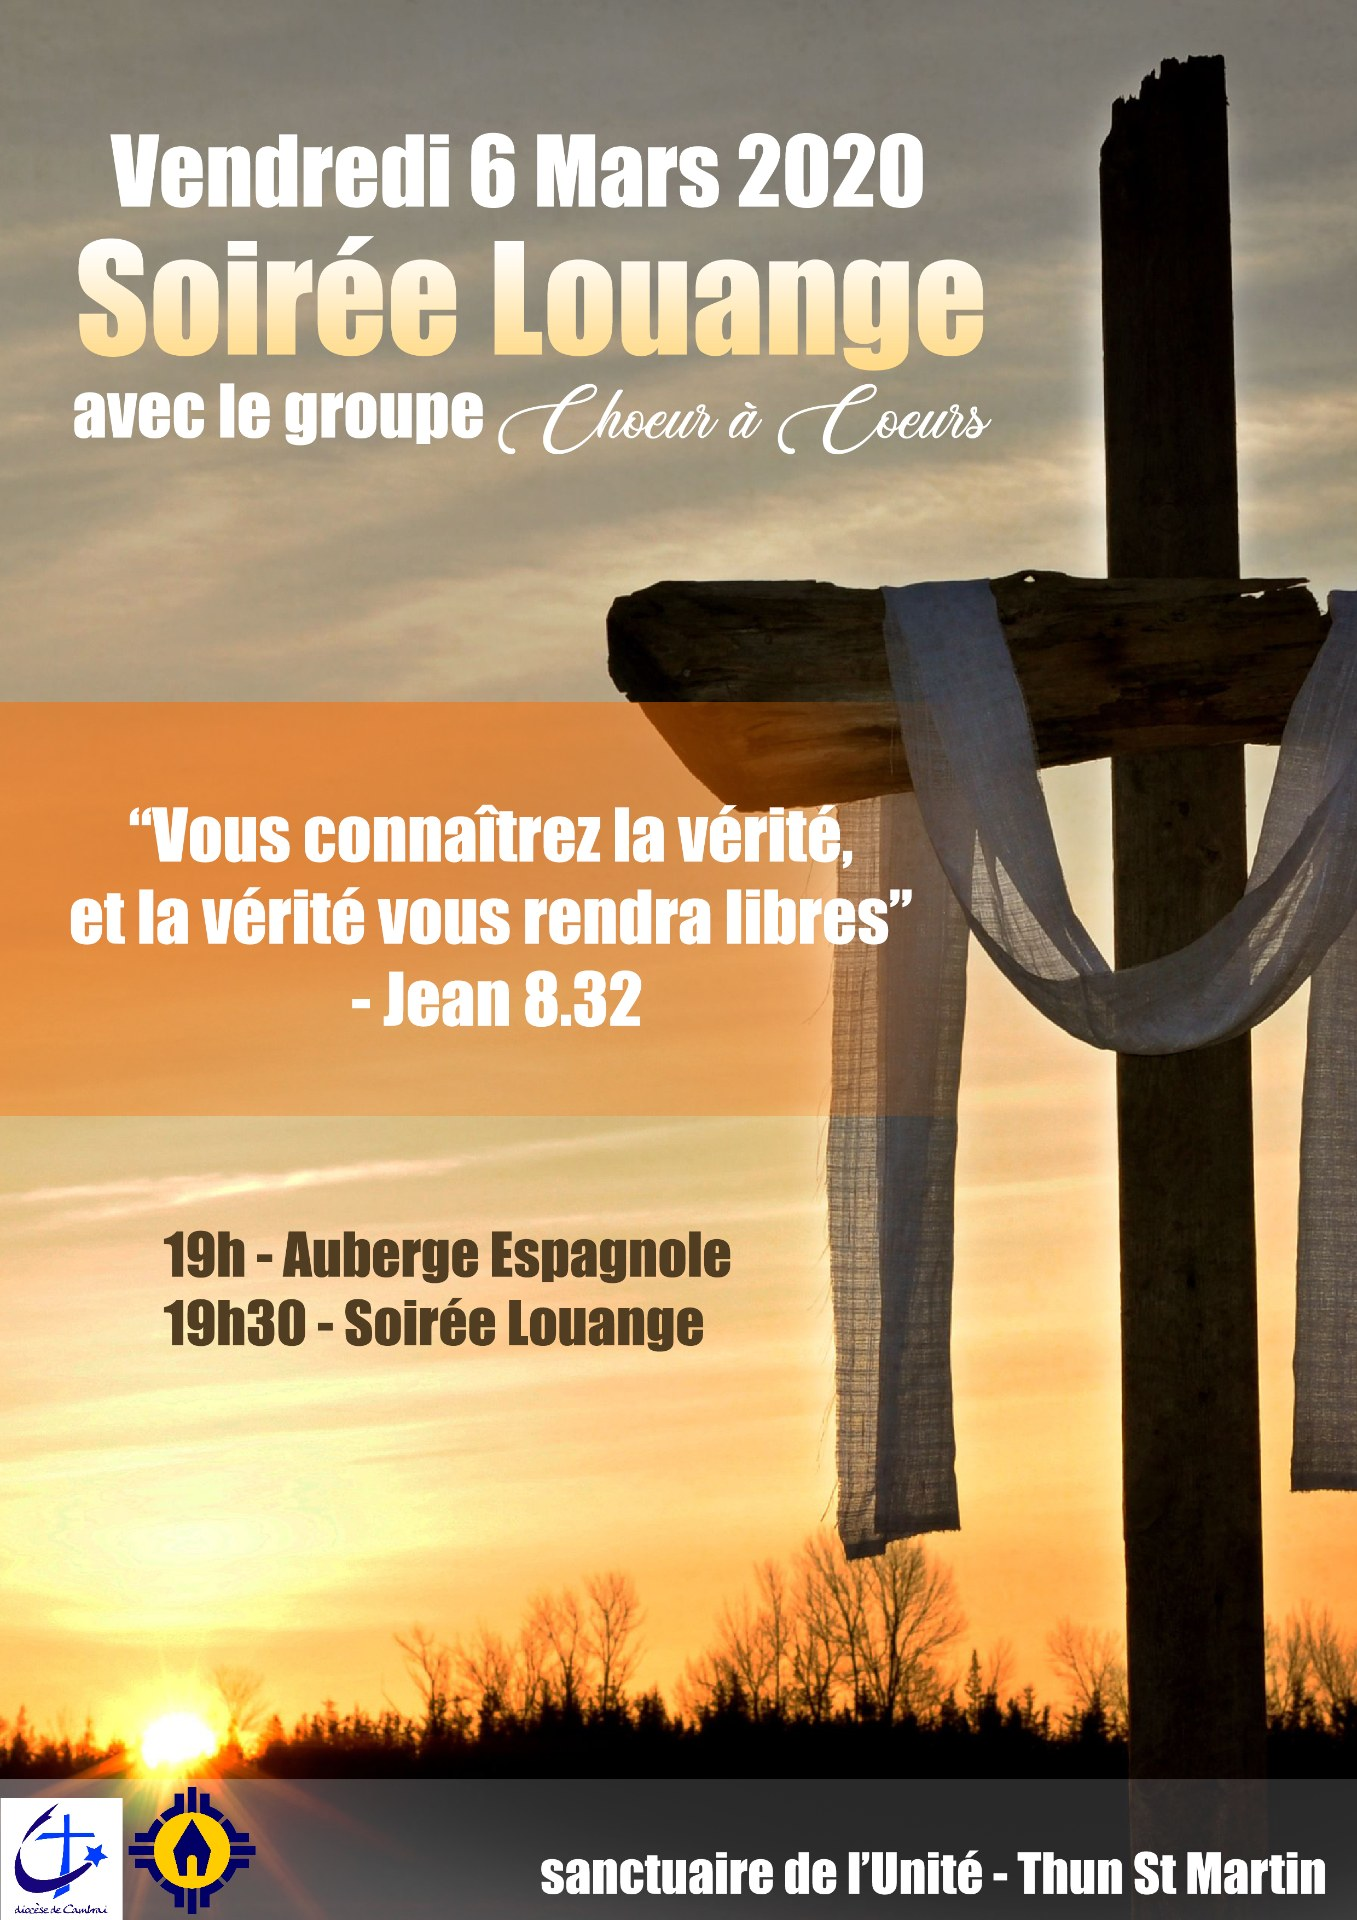 soiree louange groupe Choeur a Coeur 06-03-2020